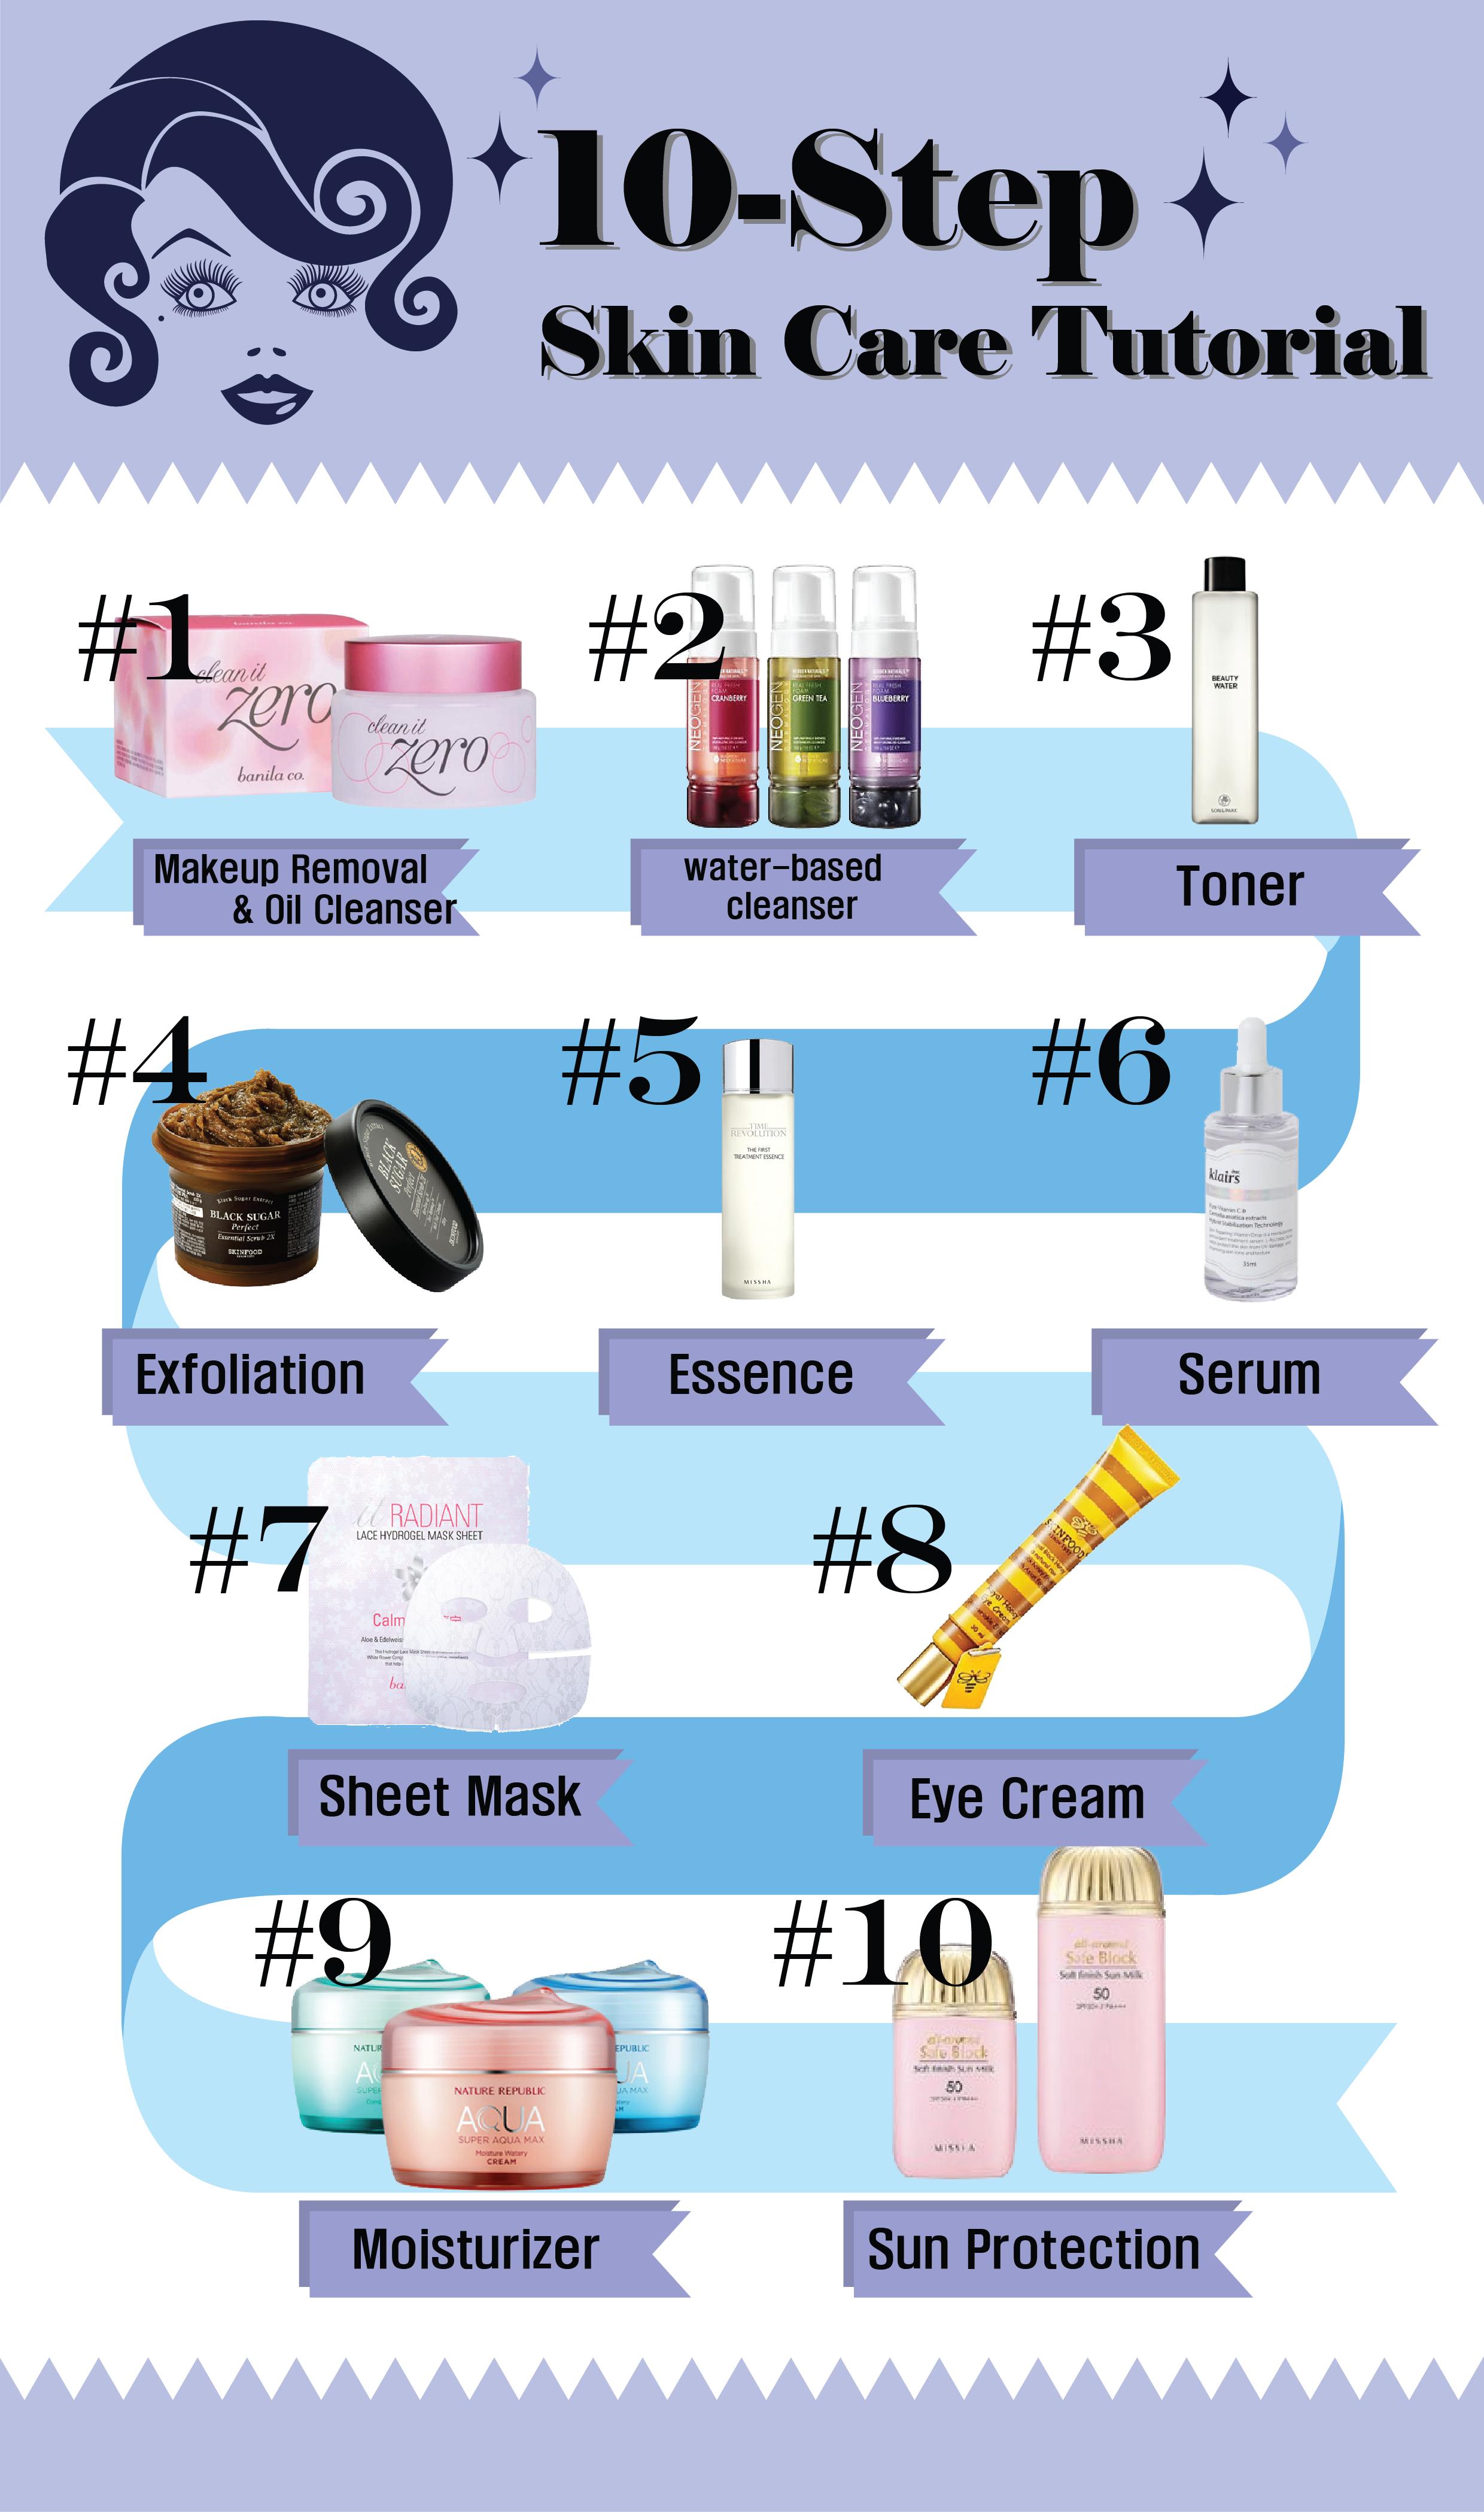 10 step skin care tutorial Skincare in Korea is a